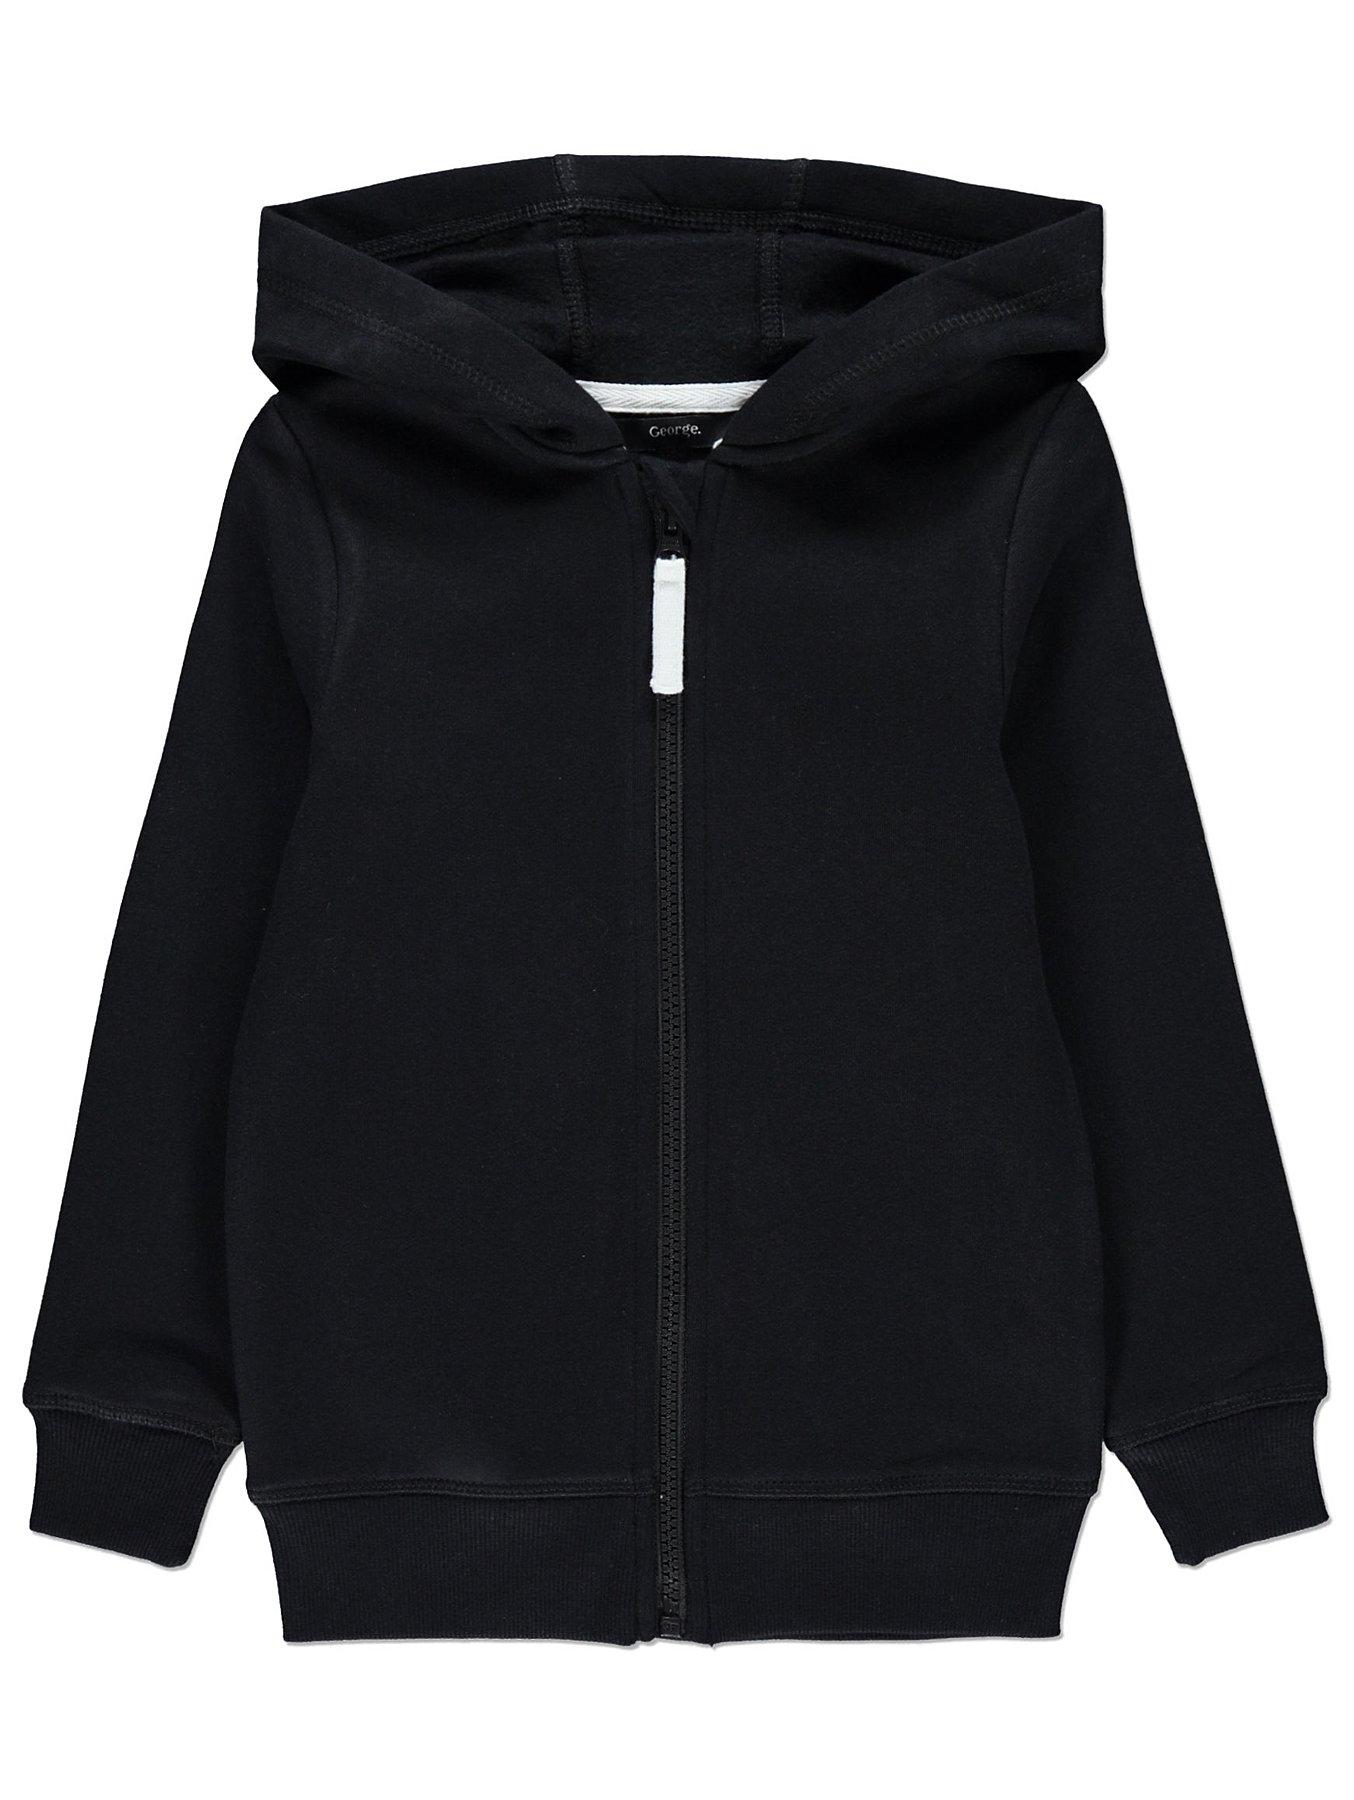 Black Zip-Up Hoodie. Reset a6859a6f1b4